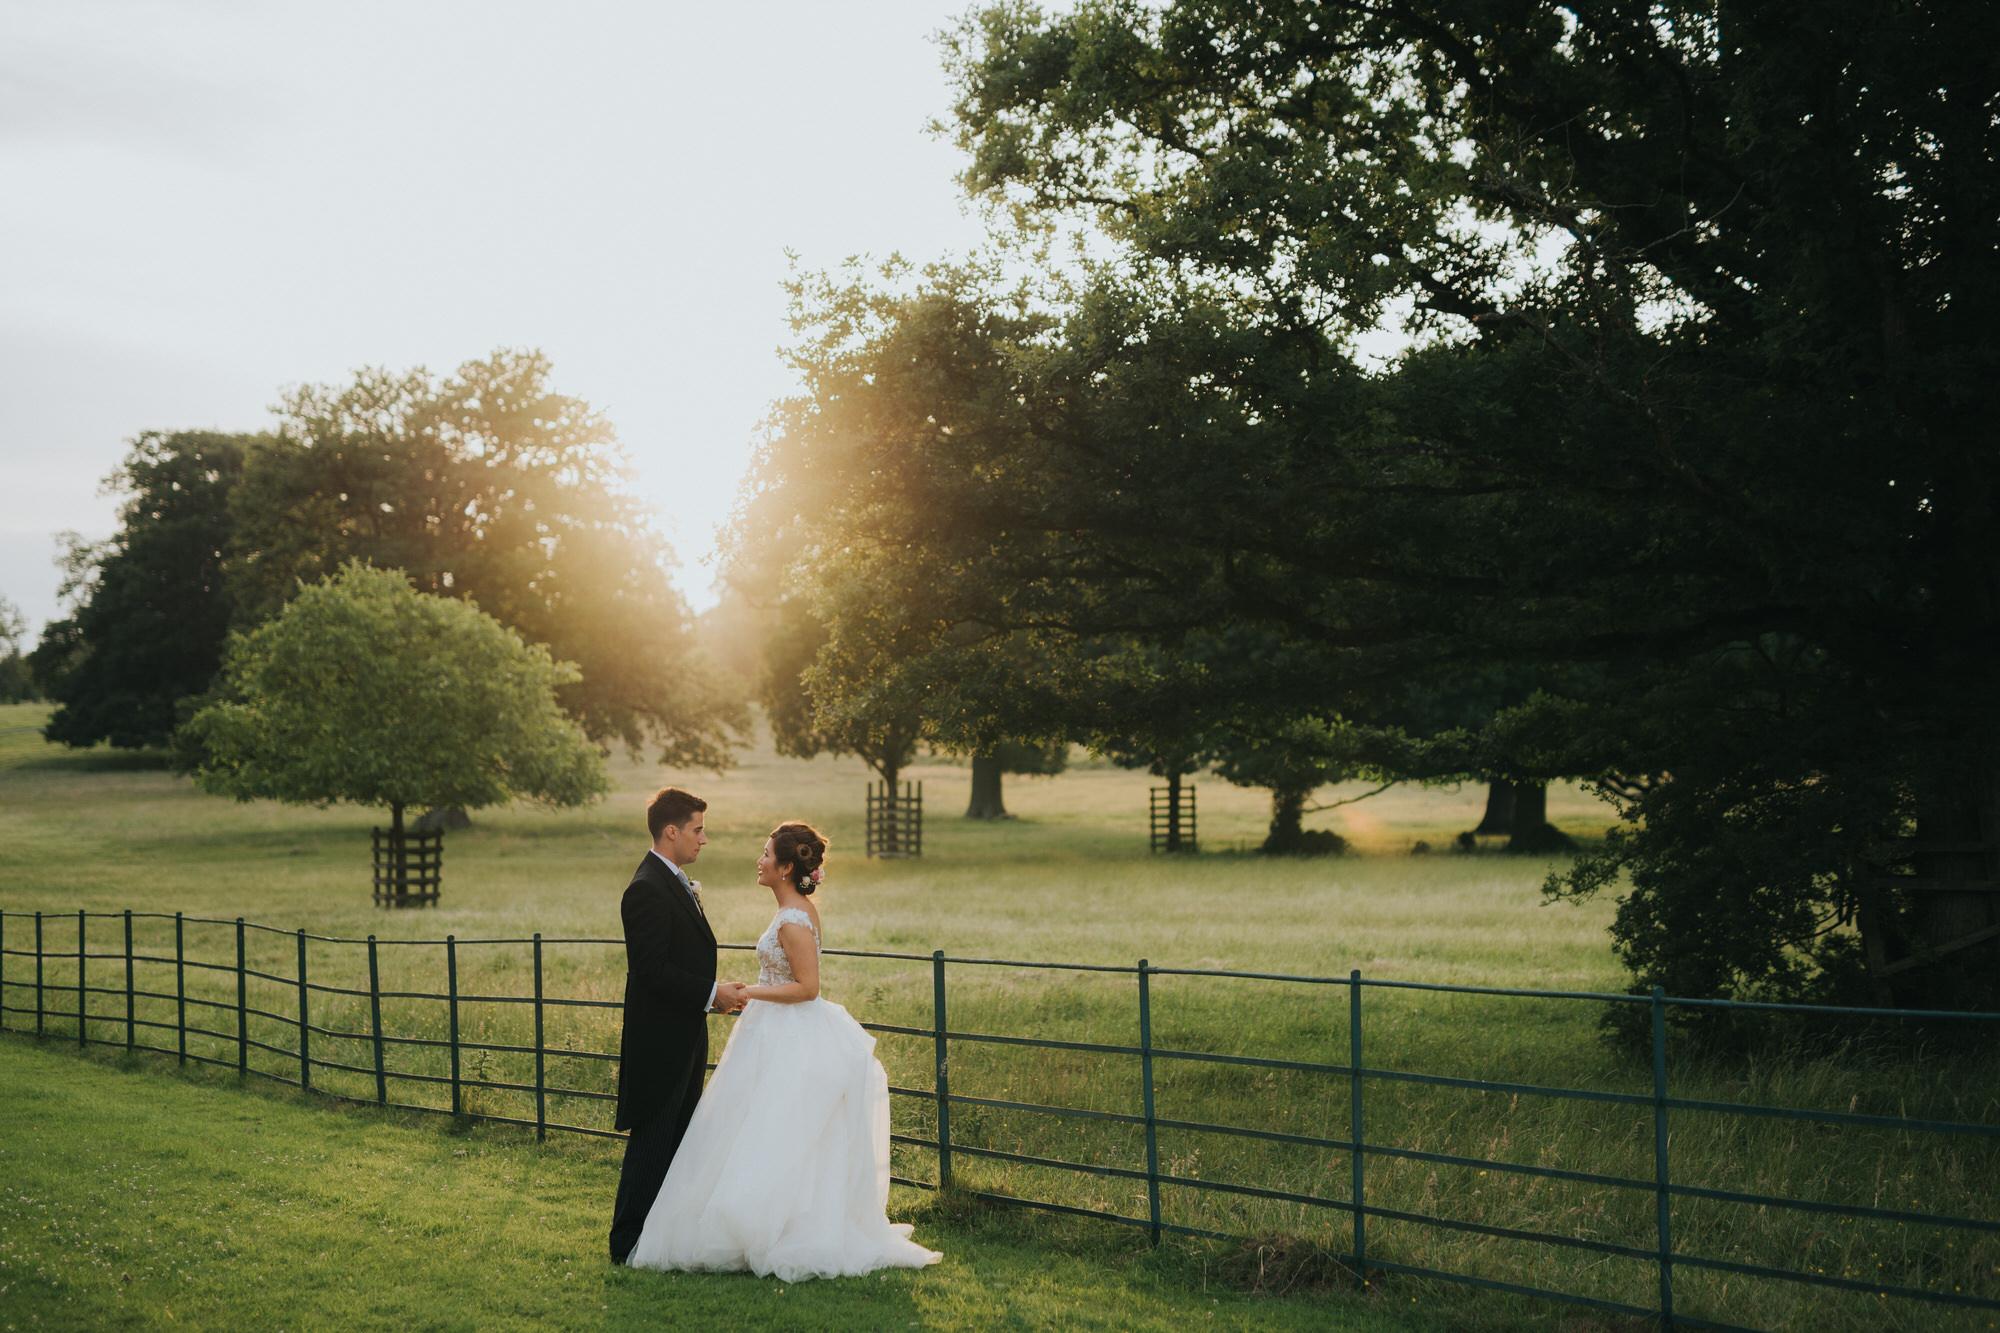 Sunset at Kirtlington park wedding